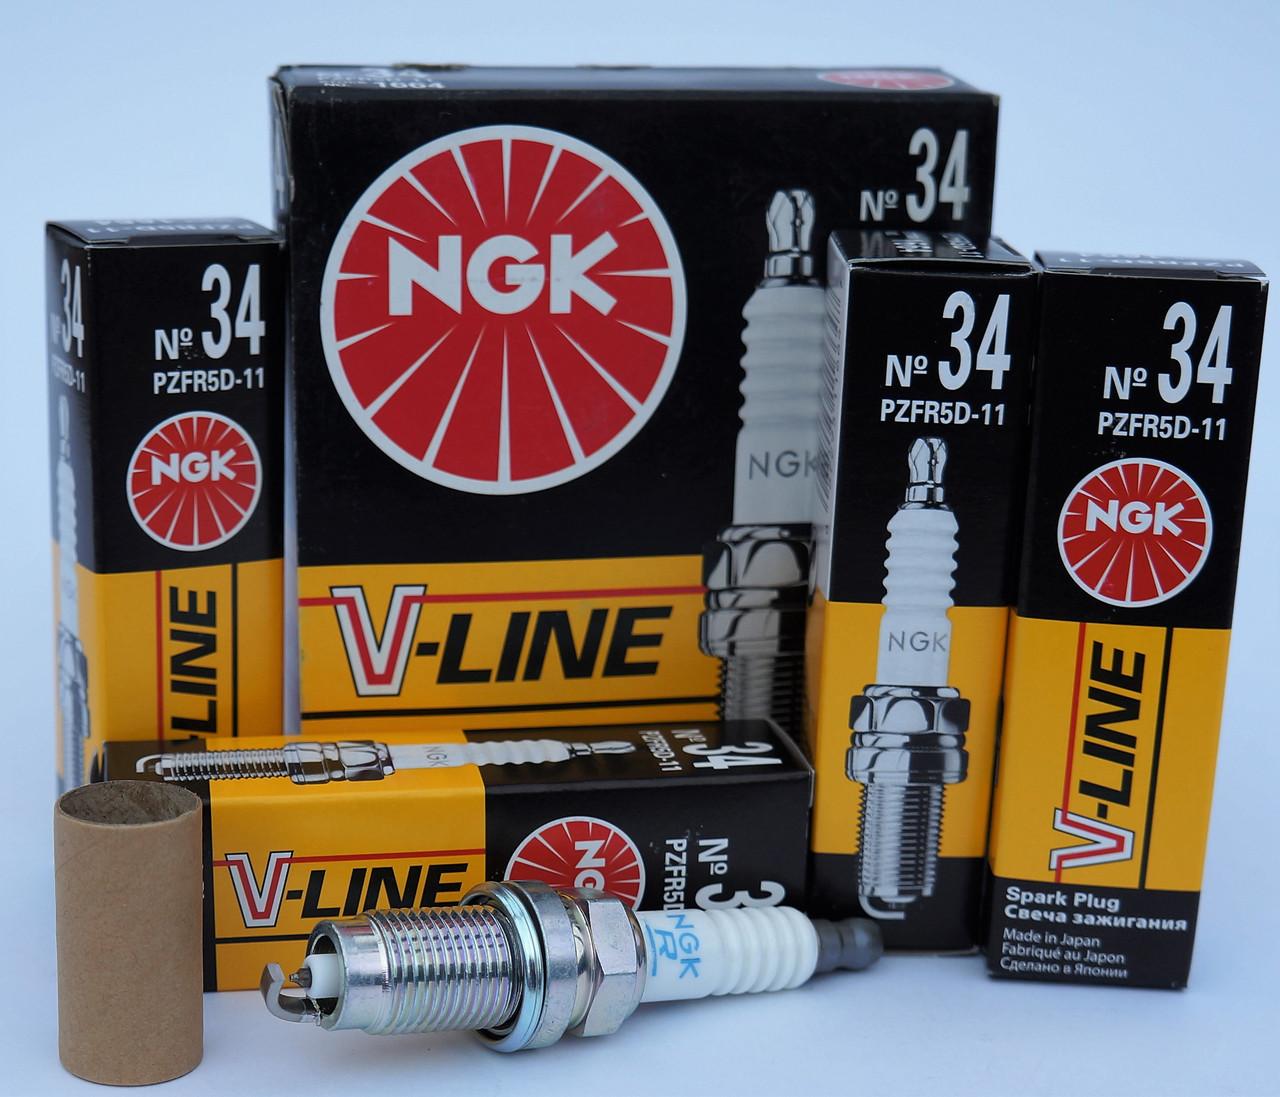 Свічки NGK V-Line 34 PZFR5D-11 /1664